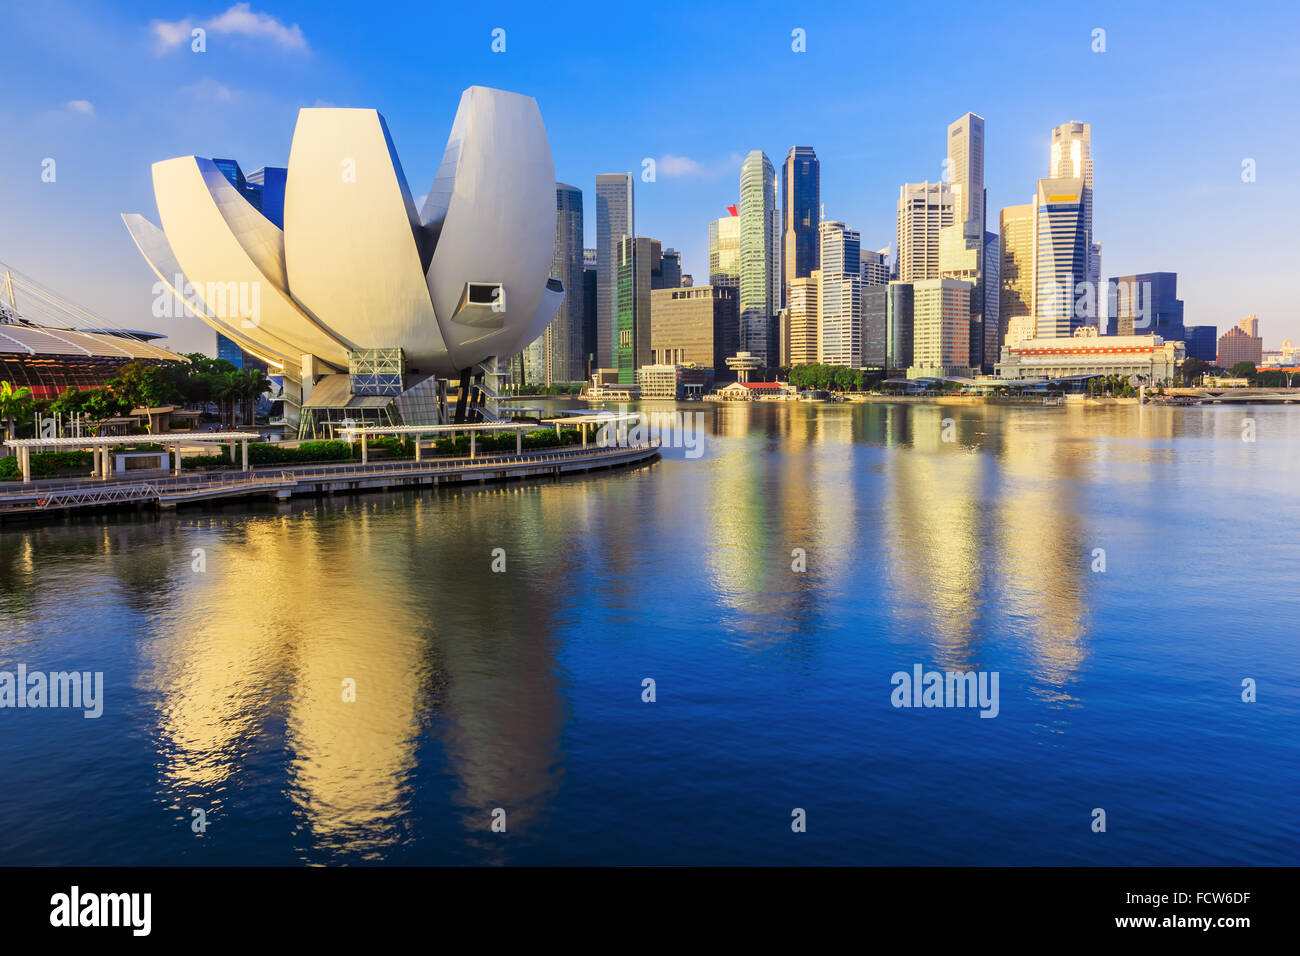 Singapore City, Singapore. Marina Bay and the skyline. - Stock Image